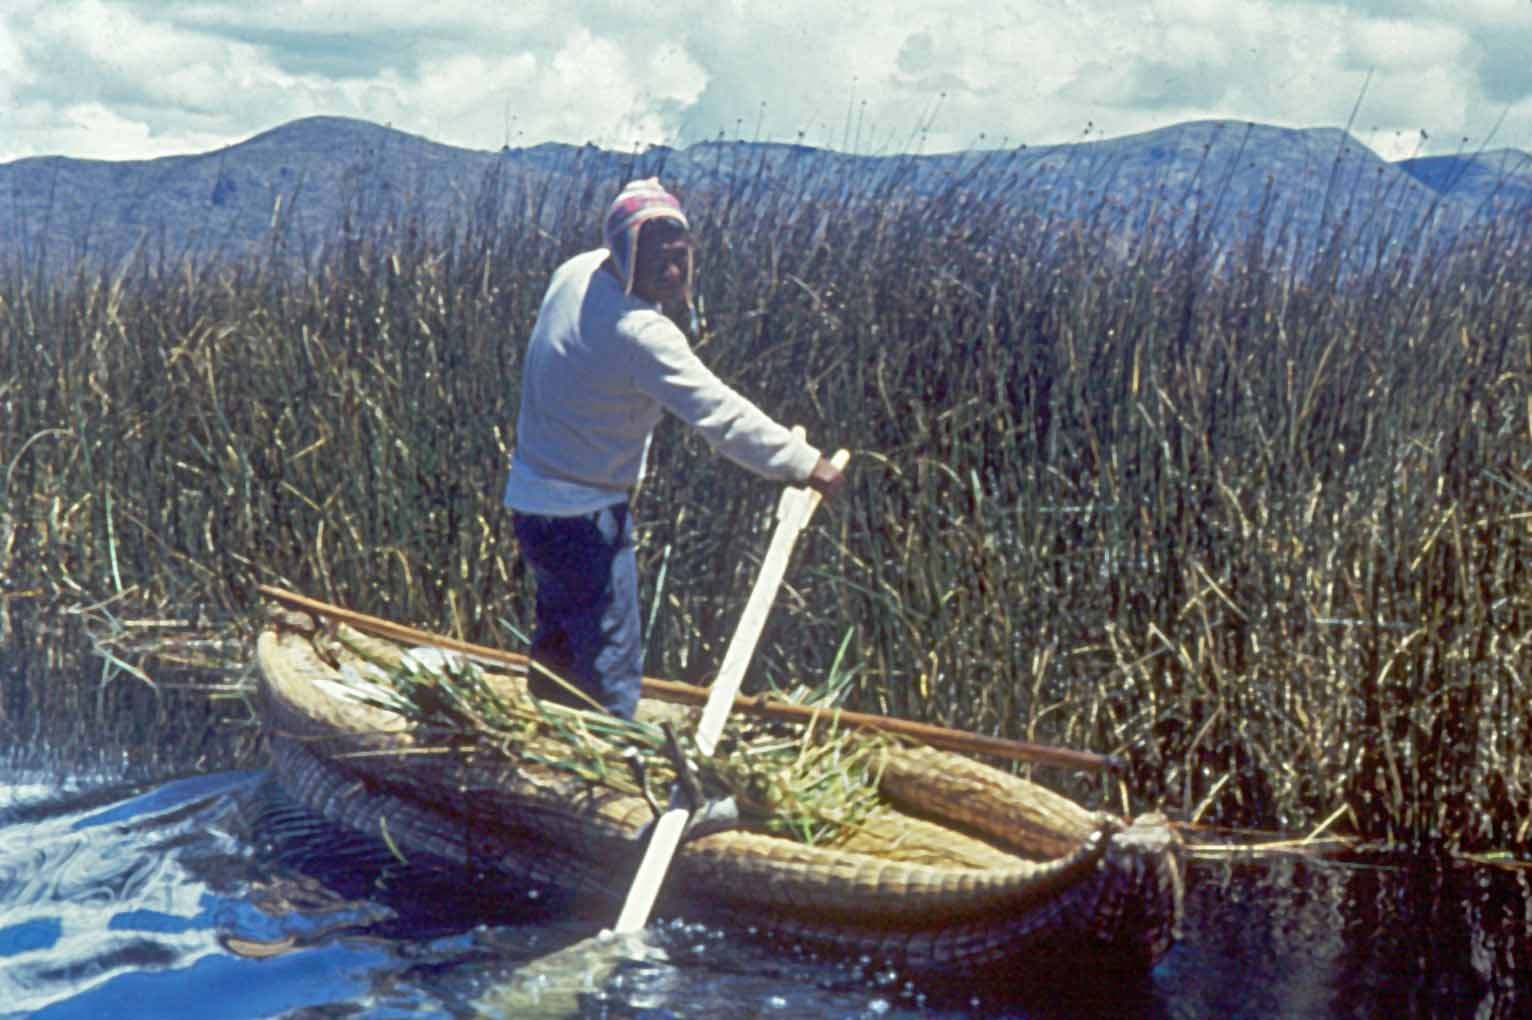 Peru - Page 2 Uros_Indian_in_a_reed_boat_Lake_Titicaca_Peru_low_res_copy